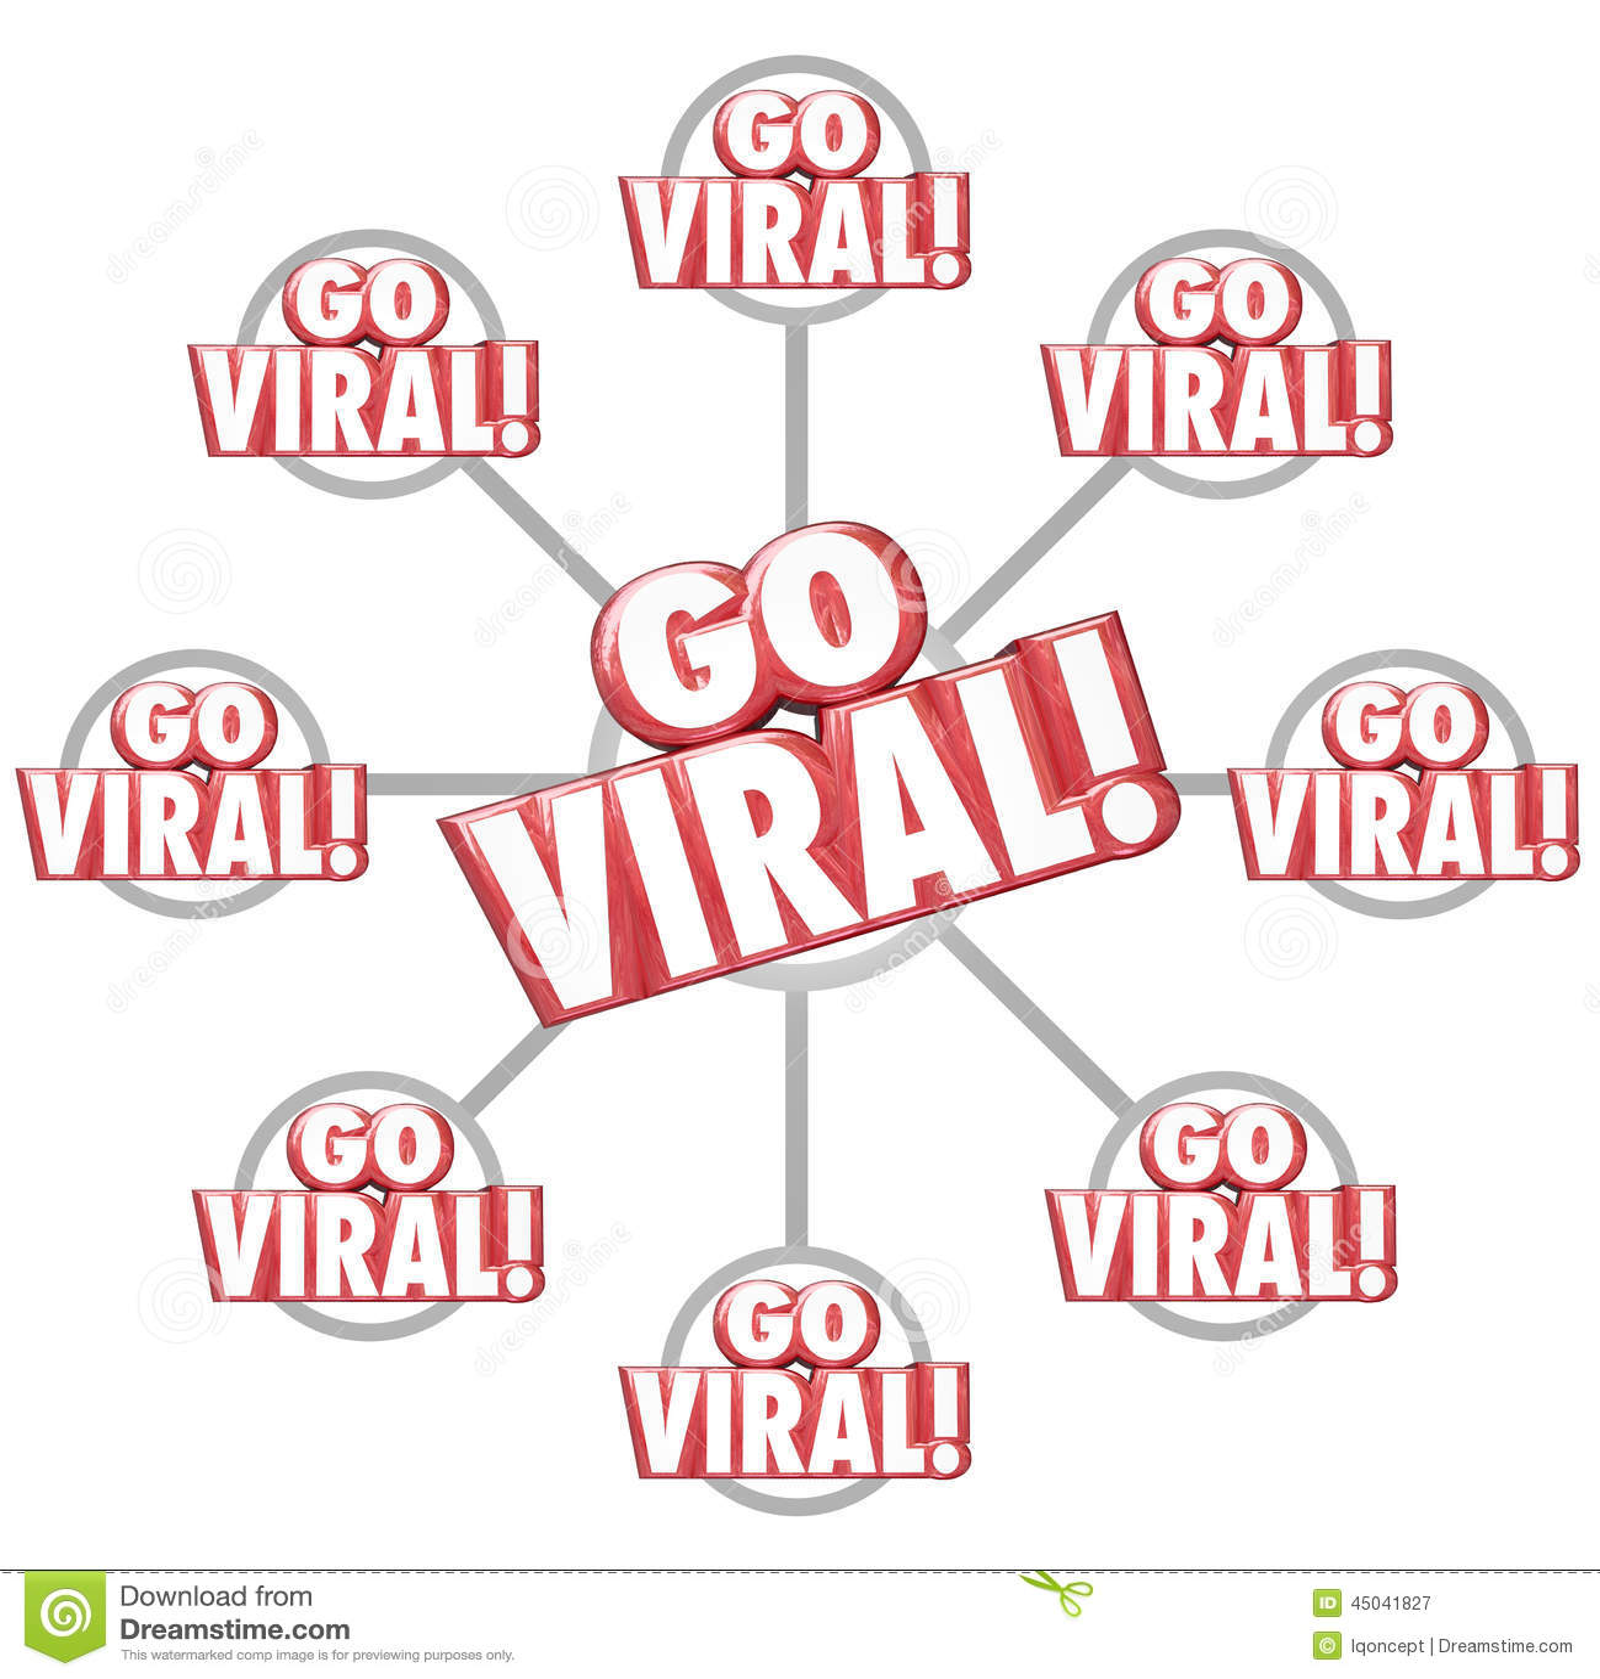 We Go Viral: Go Viral Spreading Internet Marketing Message 3d Words